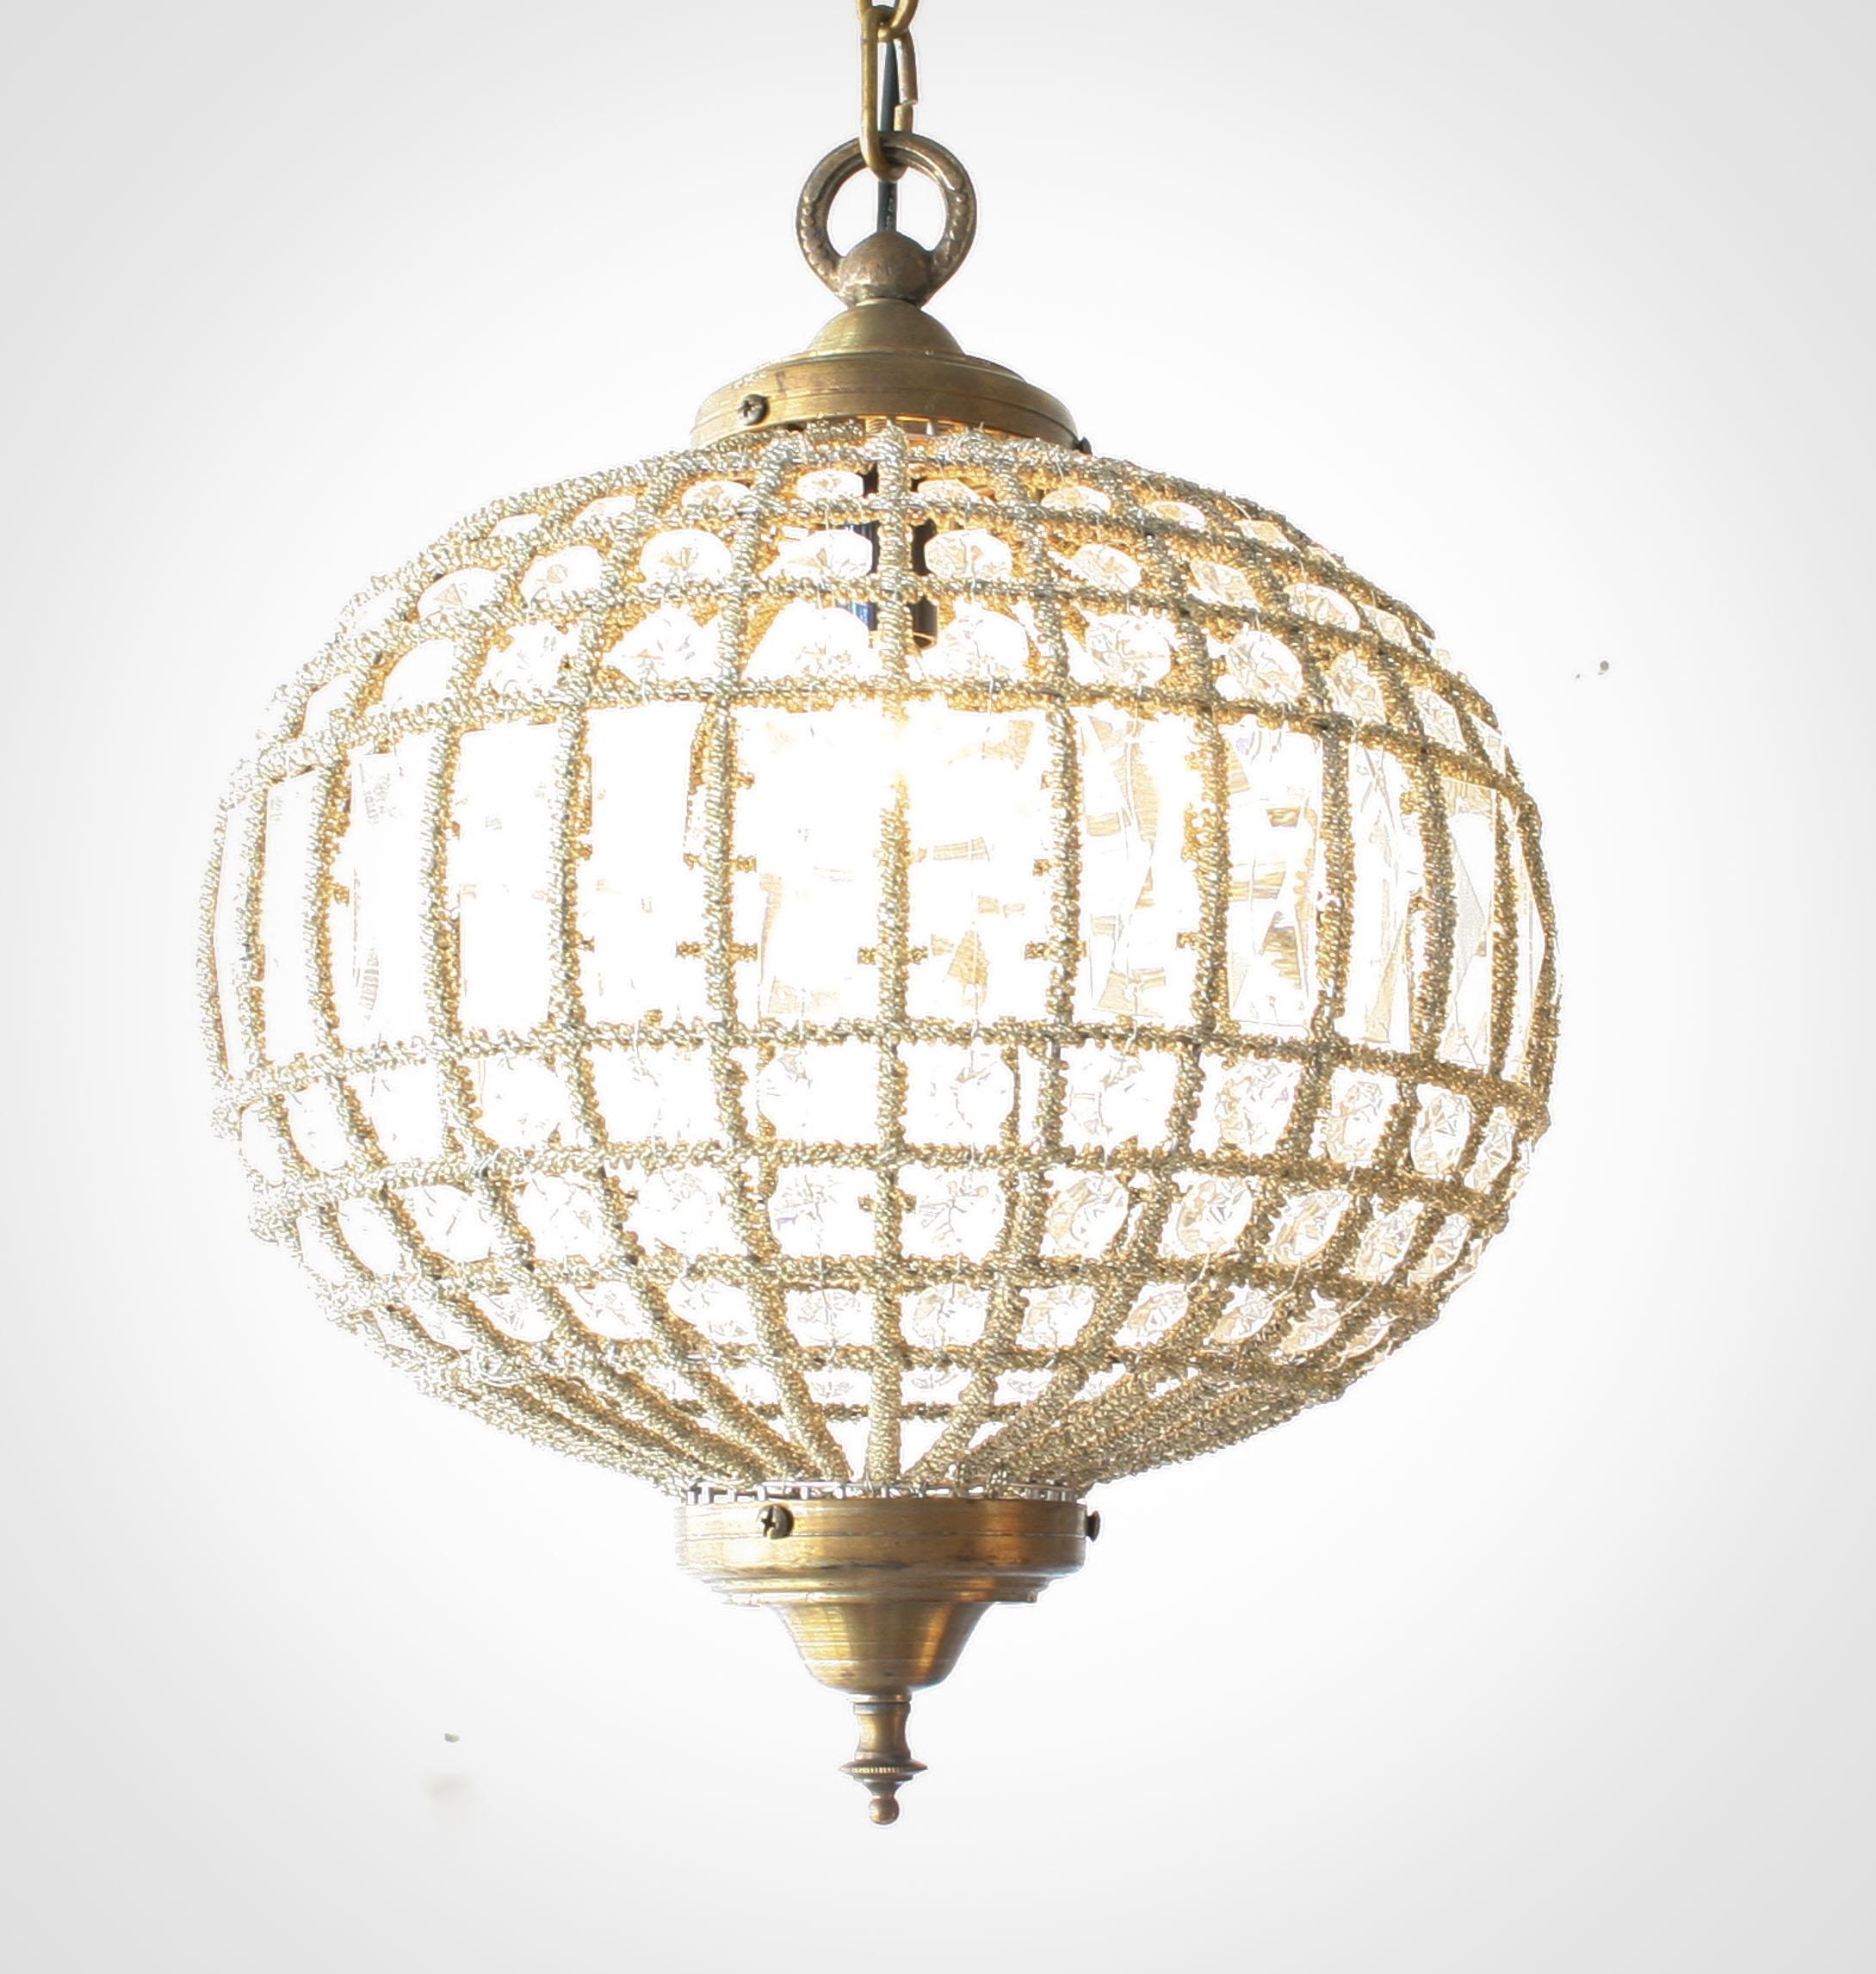 Popular Photo of Crystal Globe Chandelier